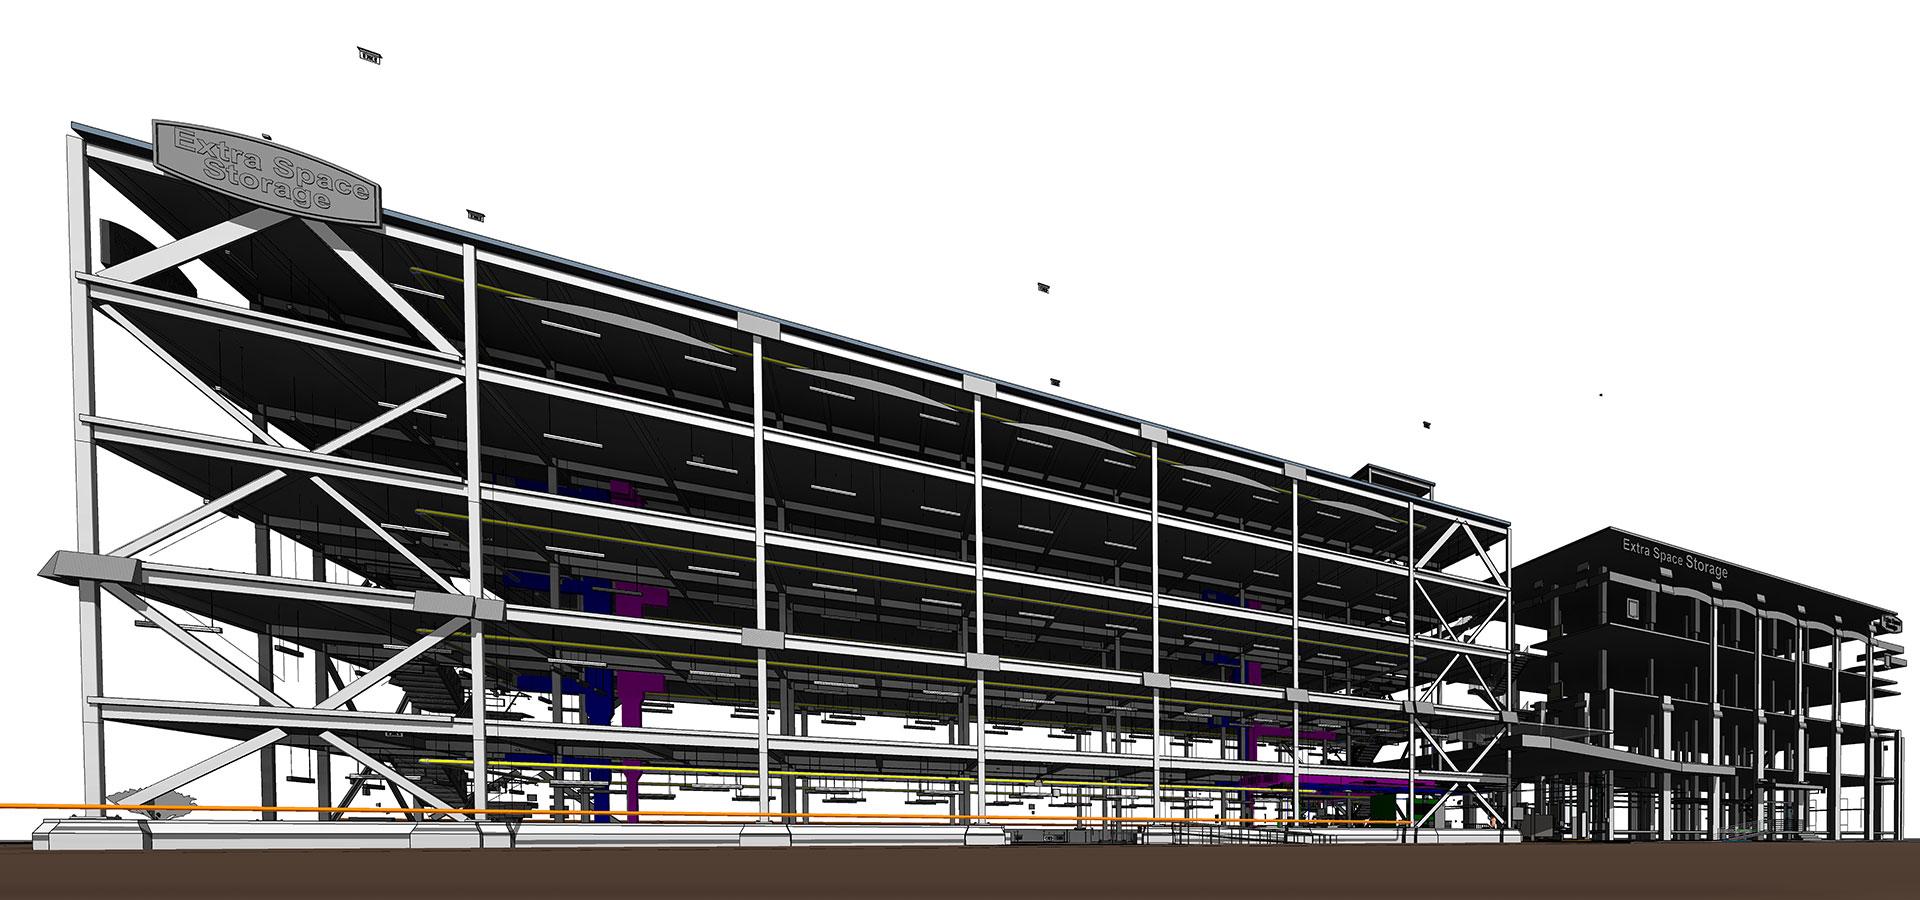 3D-Structure-MEP-BIM-Model-Commercial-Revit-Modeling-by-United-BIM